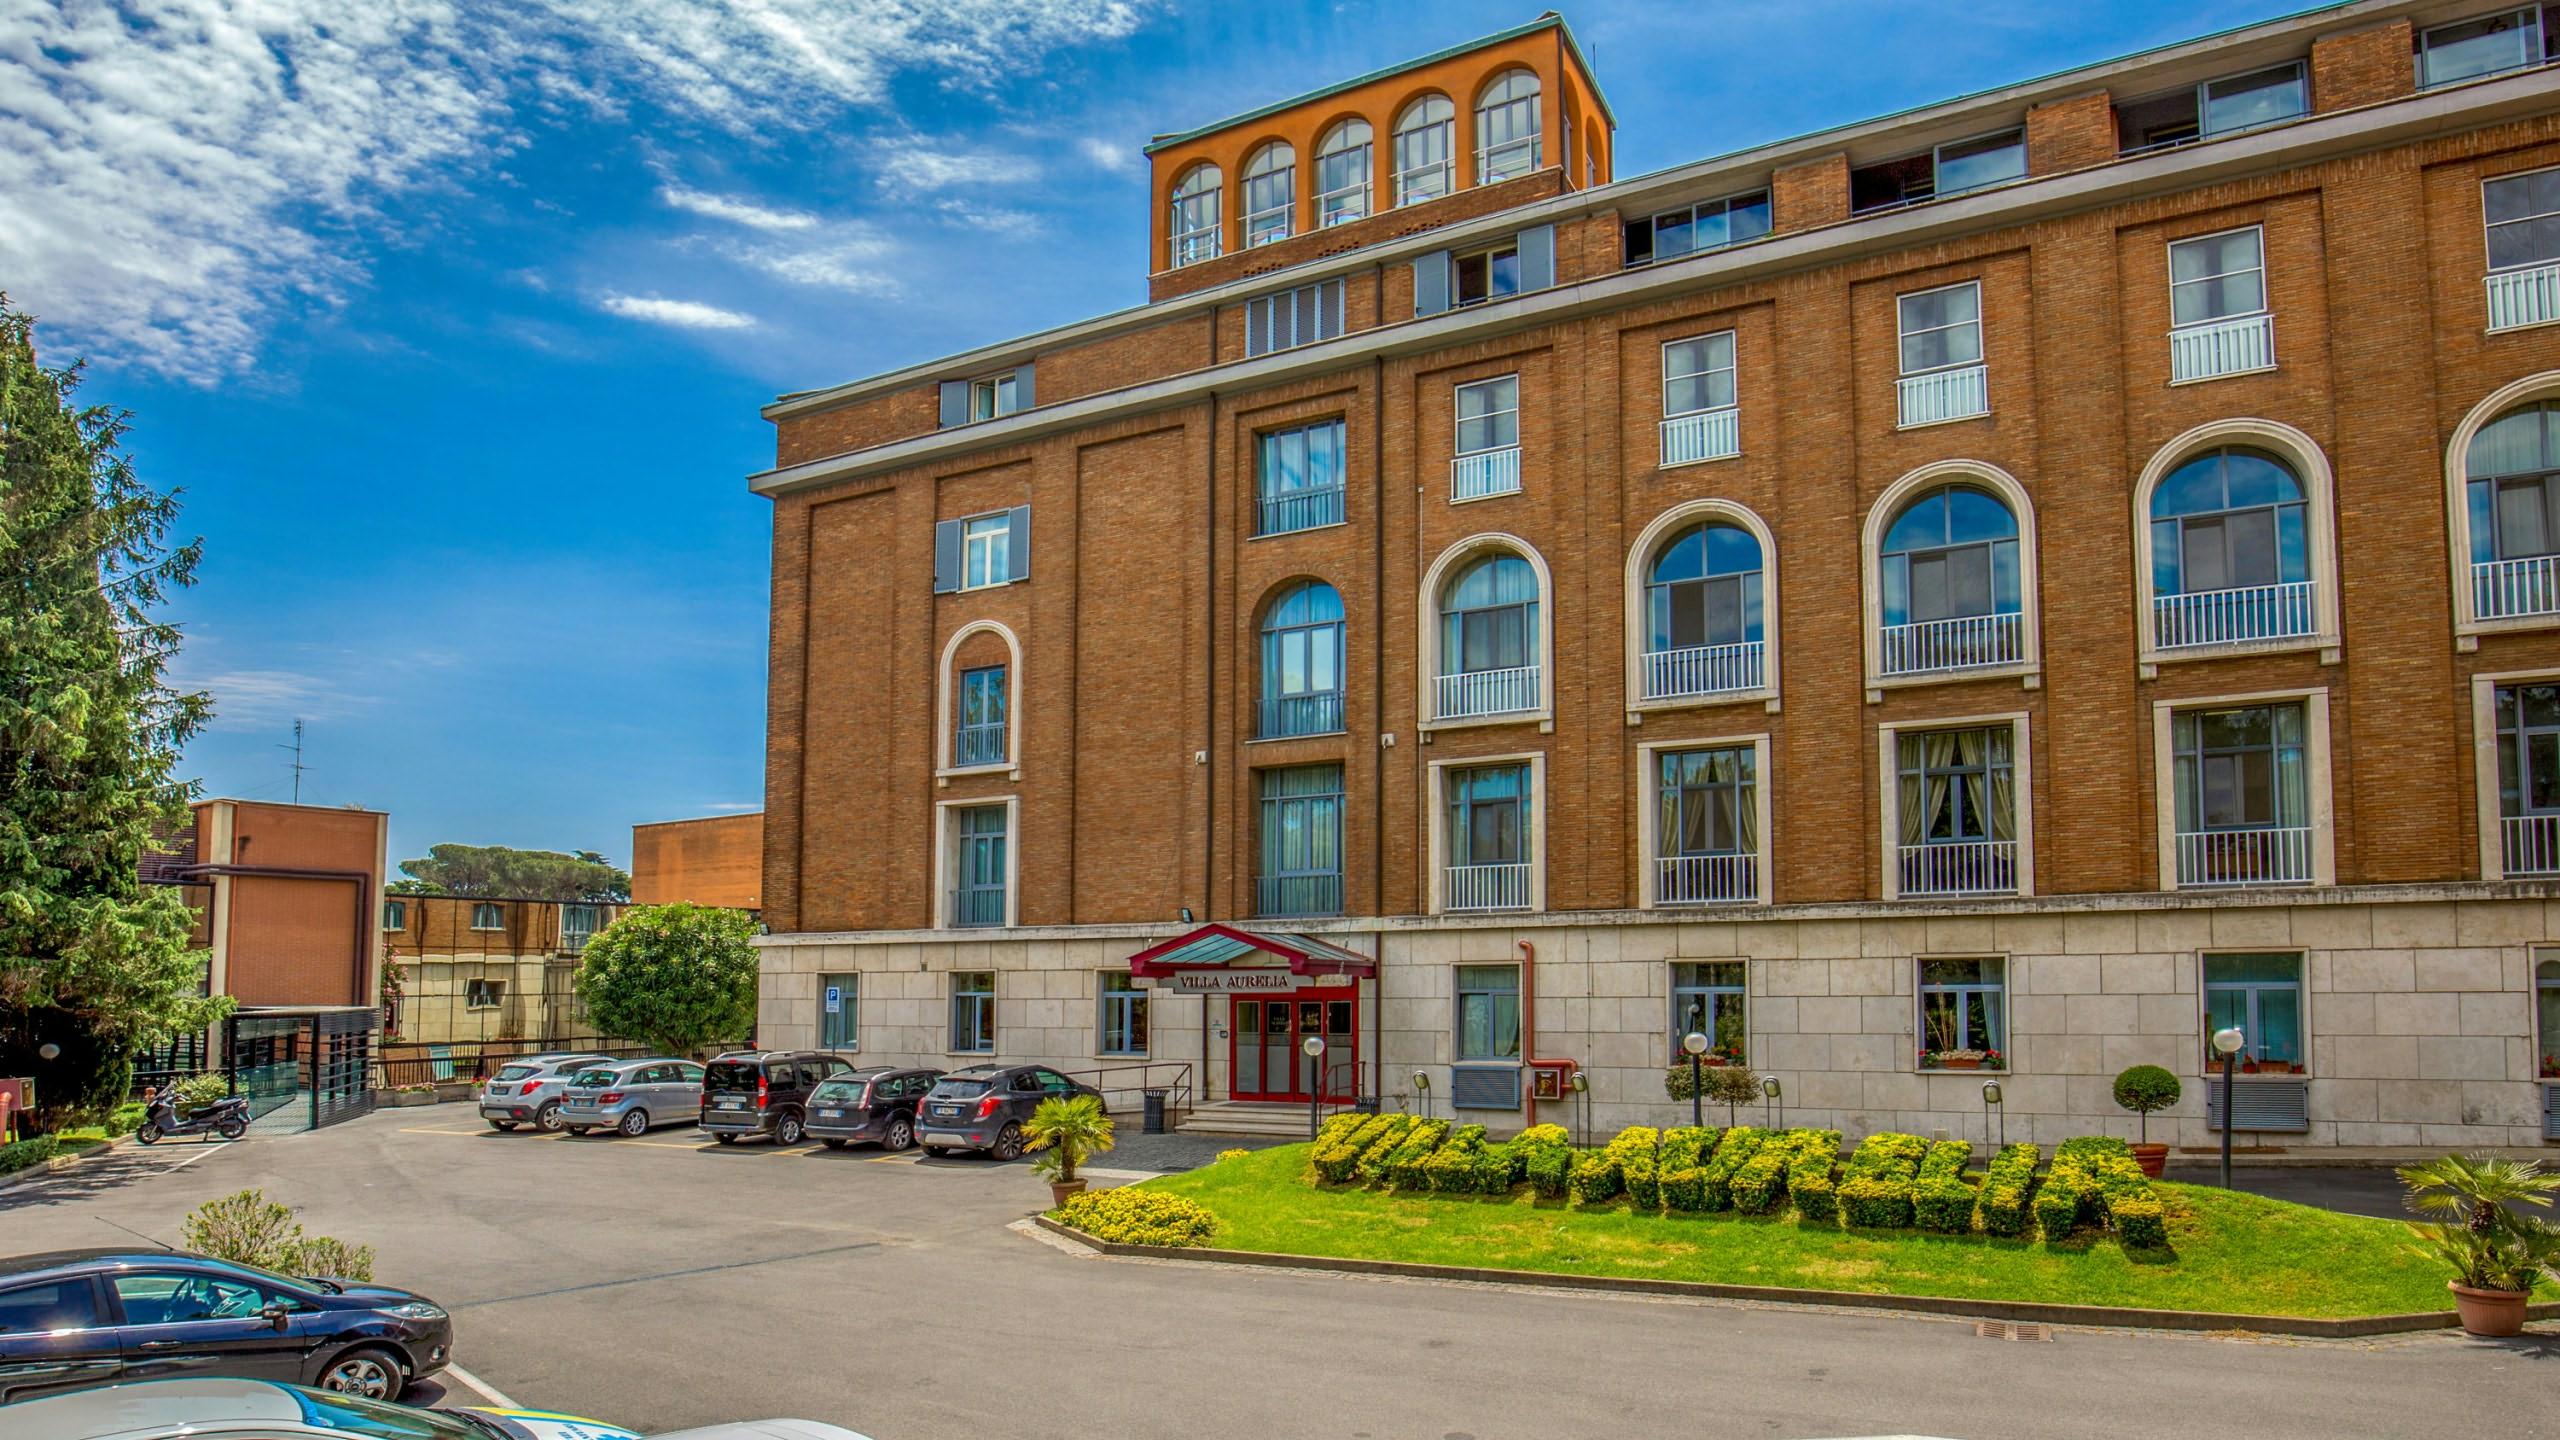 villa-aurelia-hôtel-rome-externe-01